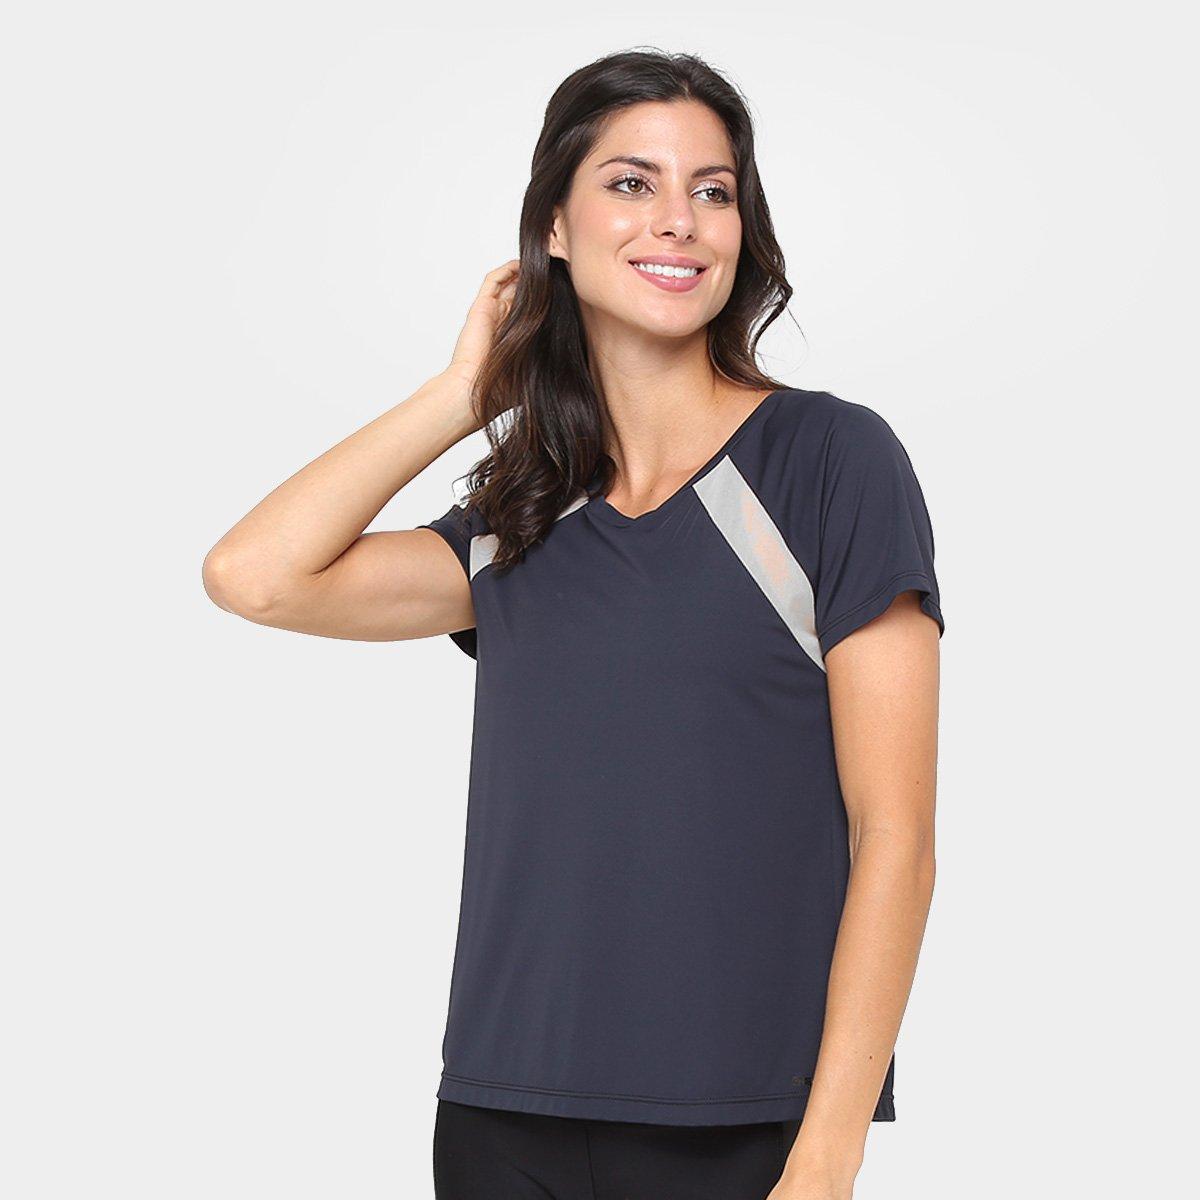 Preto Feminina Memo Camiseta Faixa Memo Camiseta Tule Faixa Tule vx8A4a6n